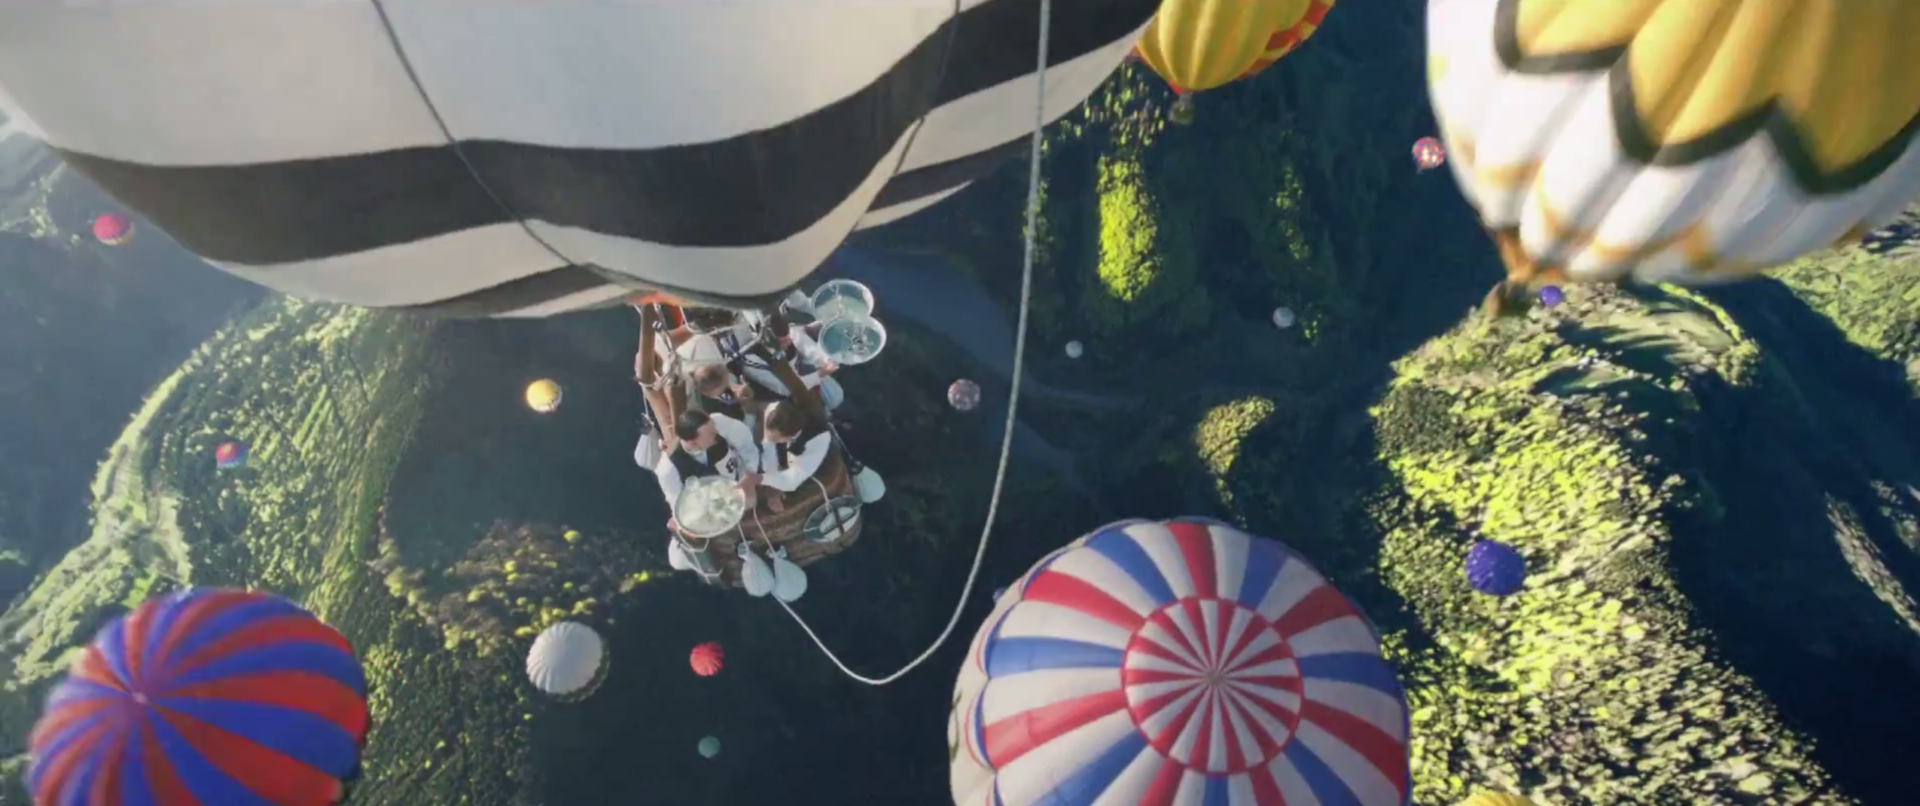 PERRIER_Hot_Air_Balloons2